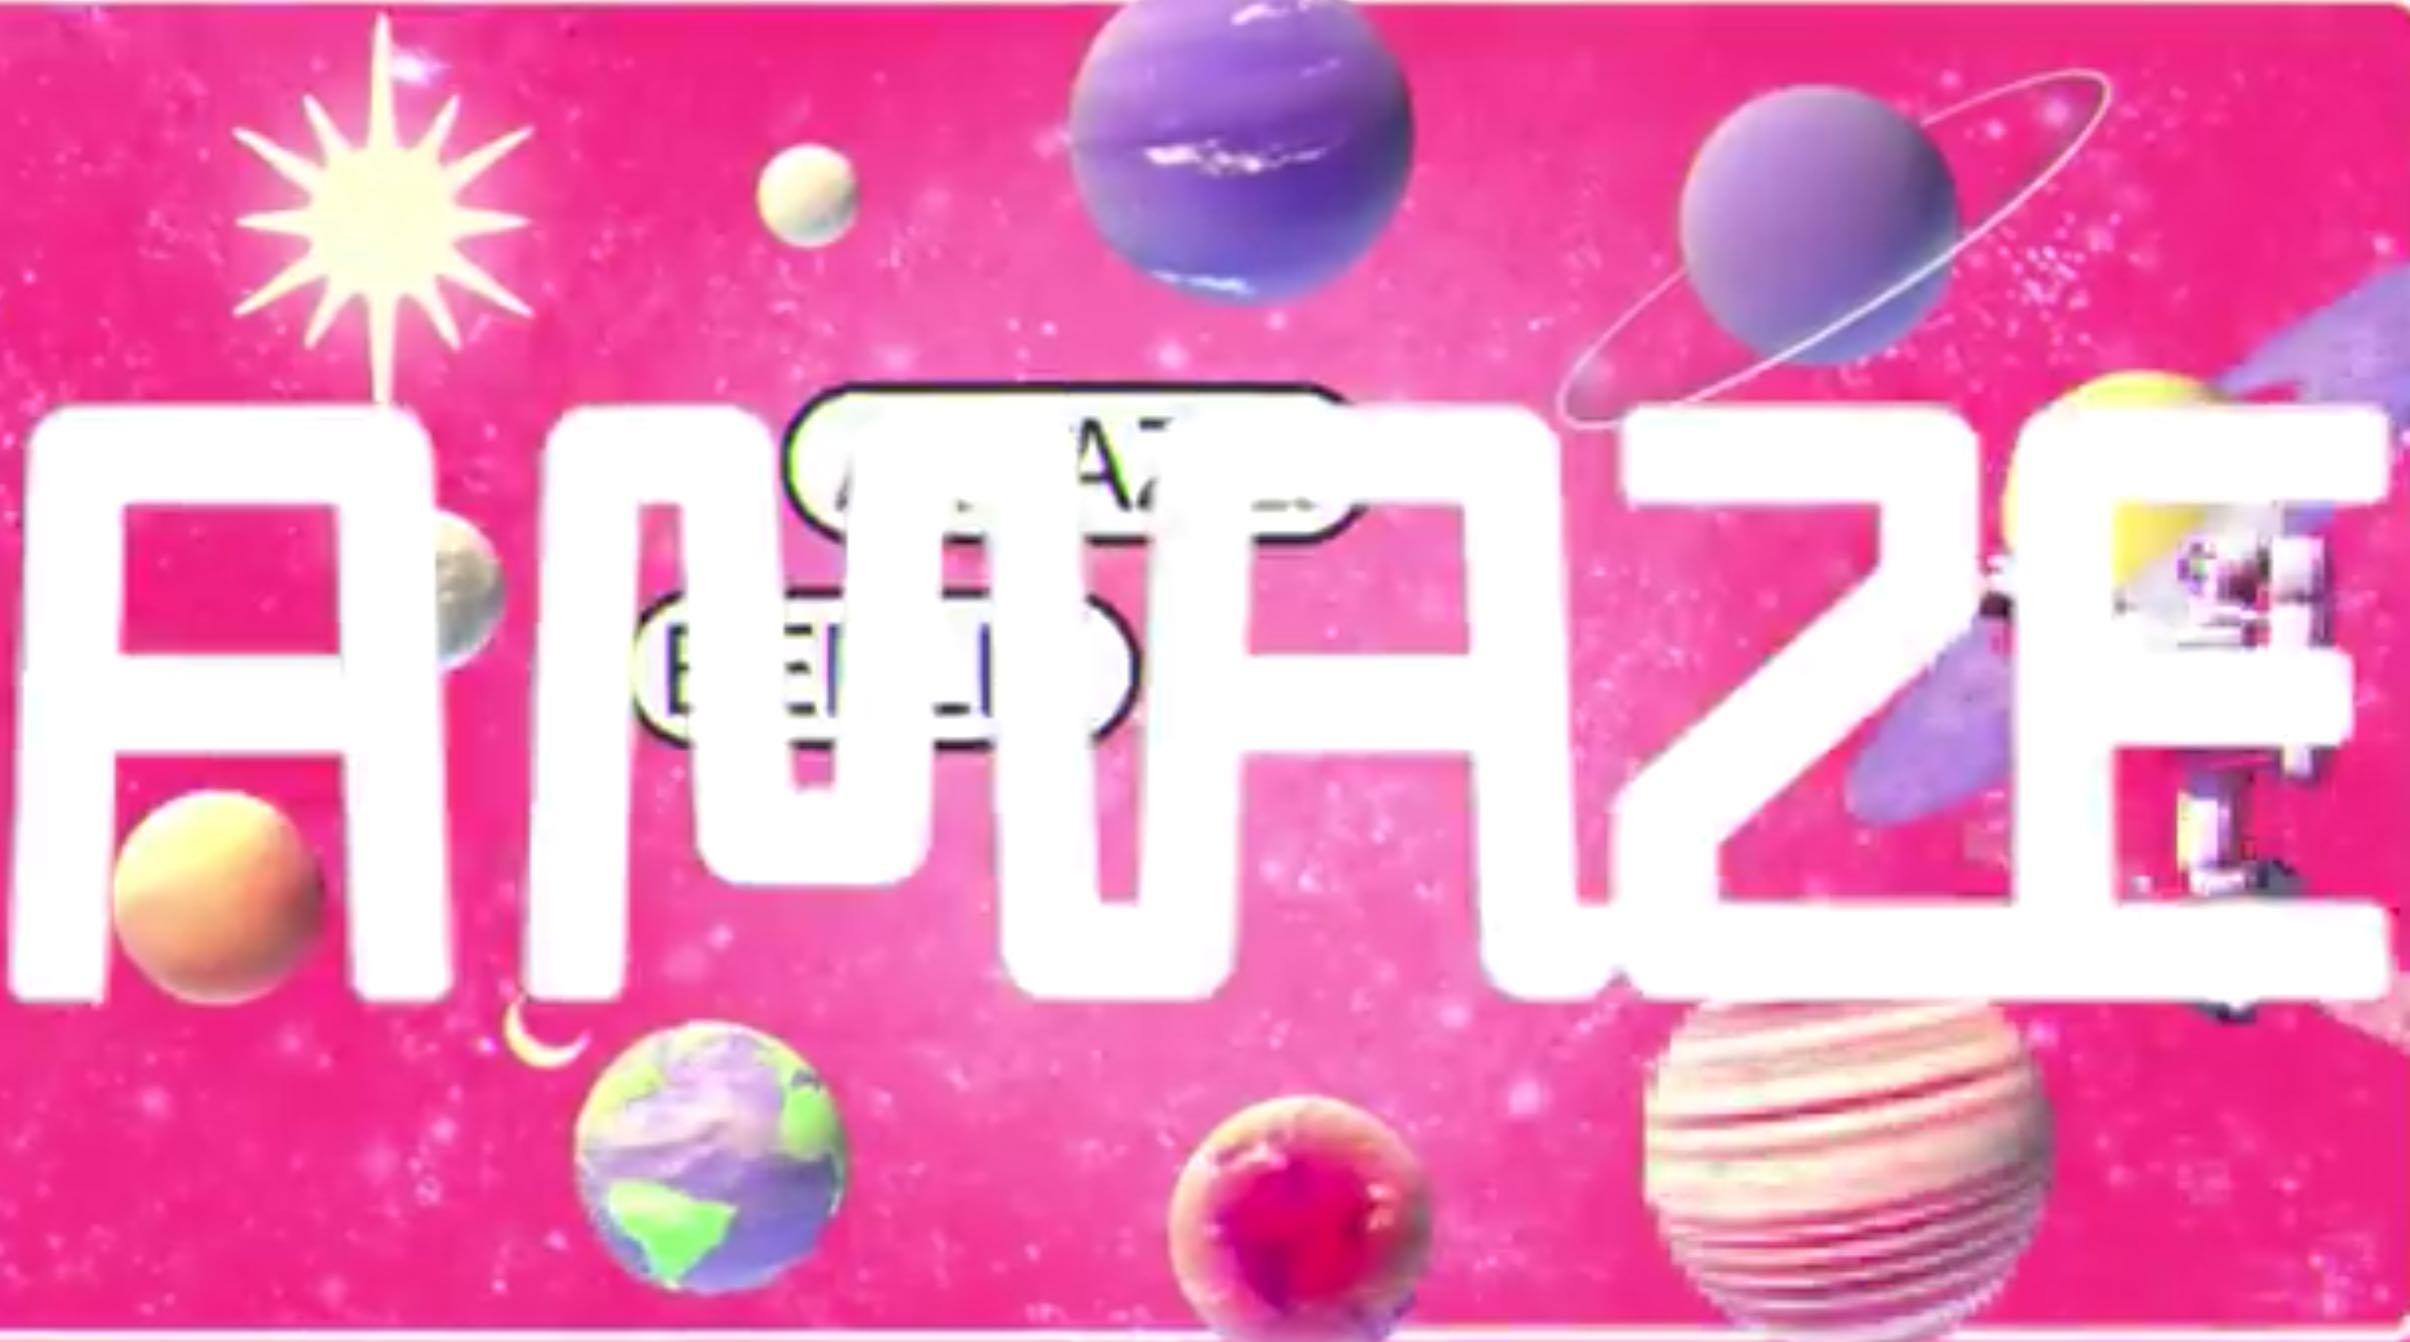 A MAZE. / Berlin 2020 - Total Digital Festival Celebration Video